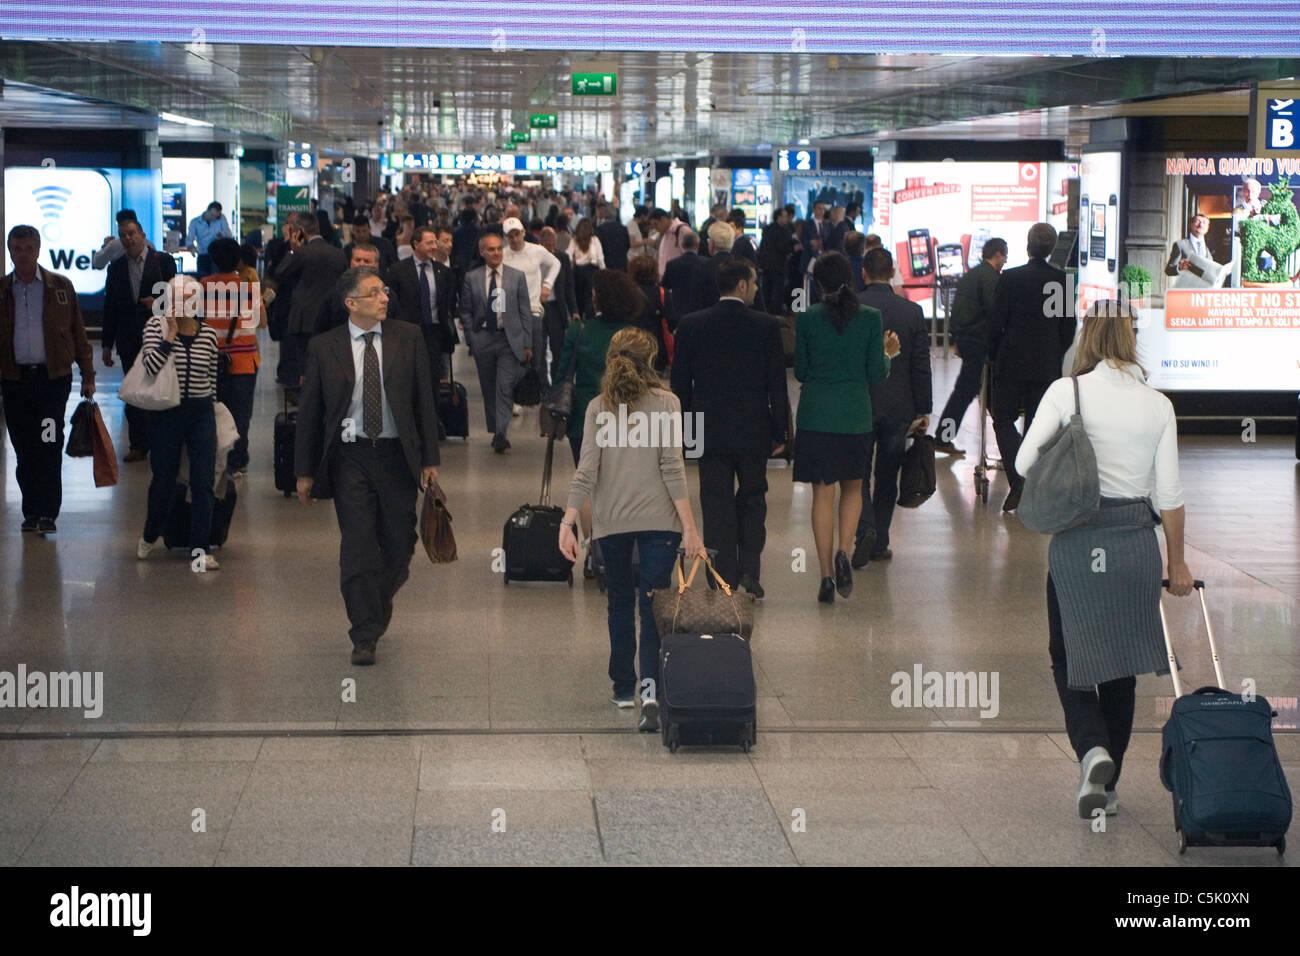 Fiumicino Airport, Rome Italy - Stock Image